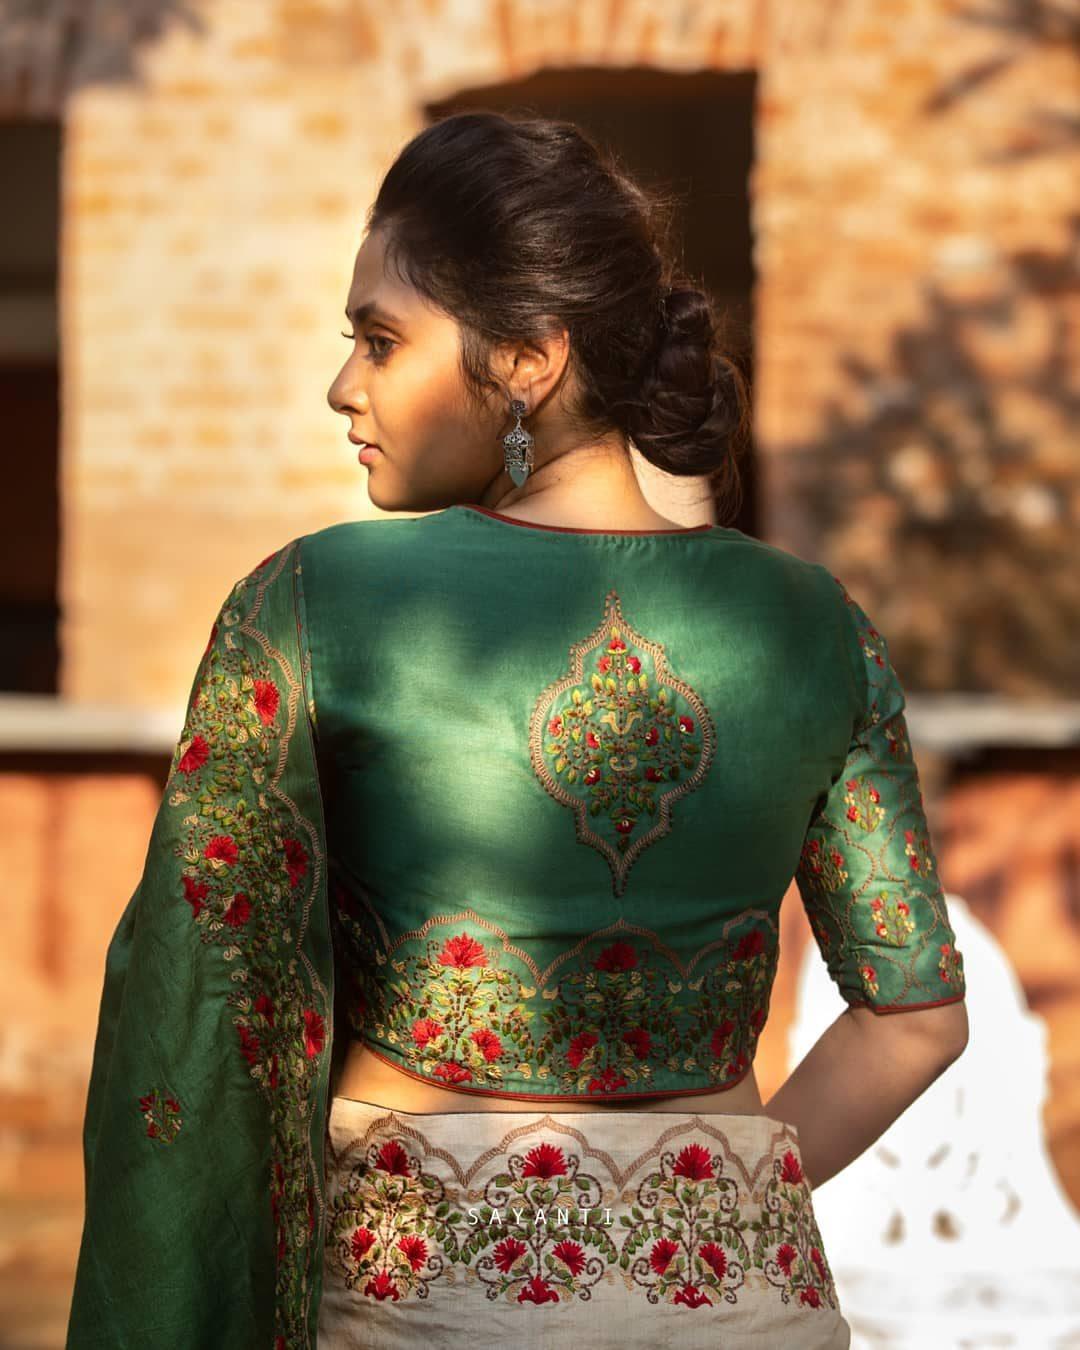 Persian architecture embroidery blouse-Sayanti ghosh